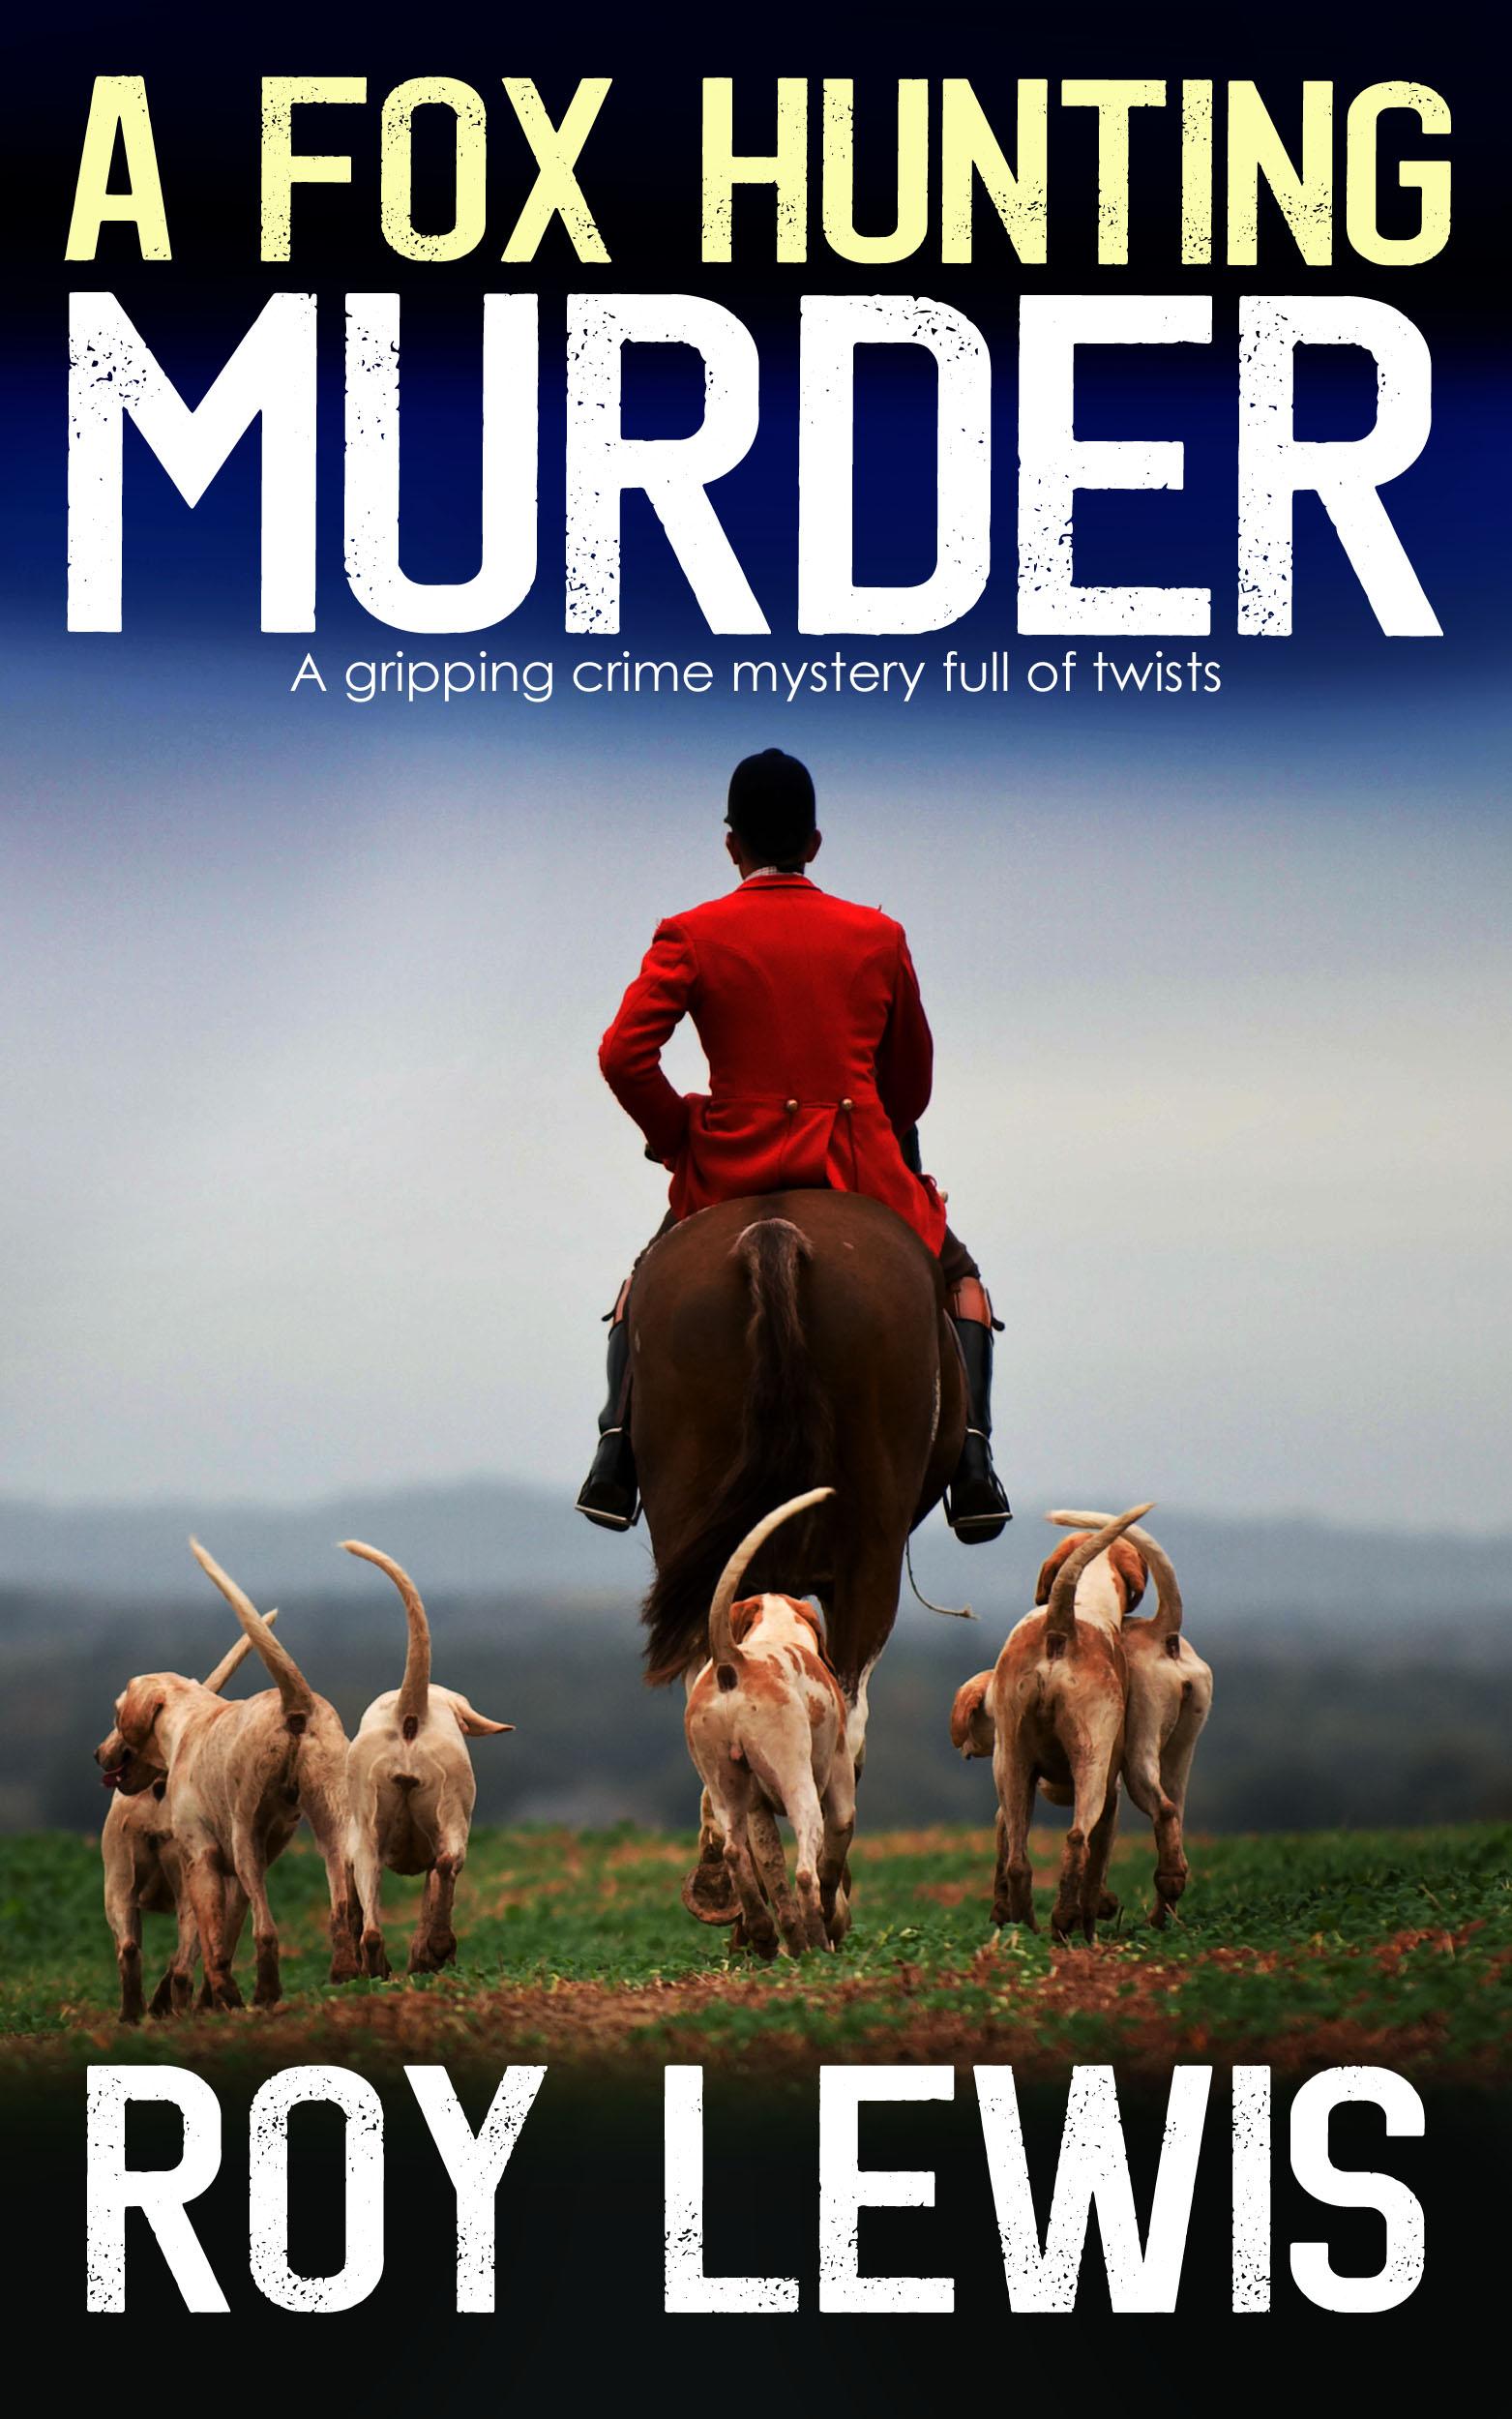 A Fox Hunt Murder.jpg